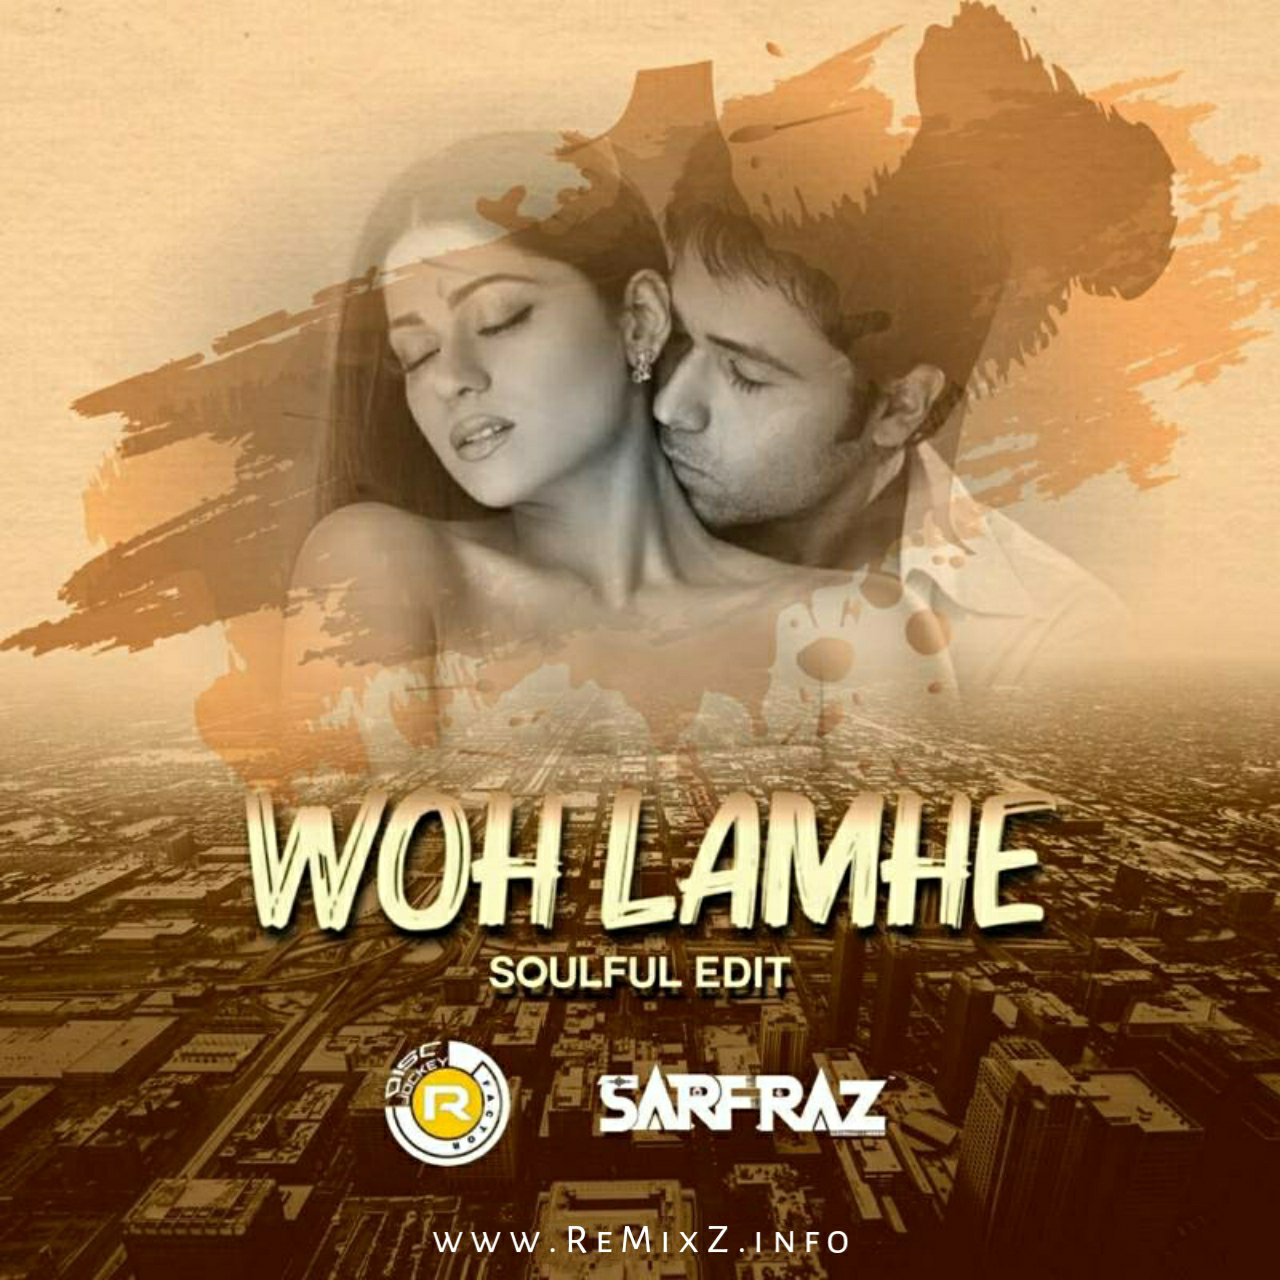 woh-lamhe-soulful-edit-dj-r-factor-xsarfraz